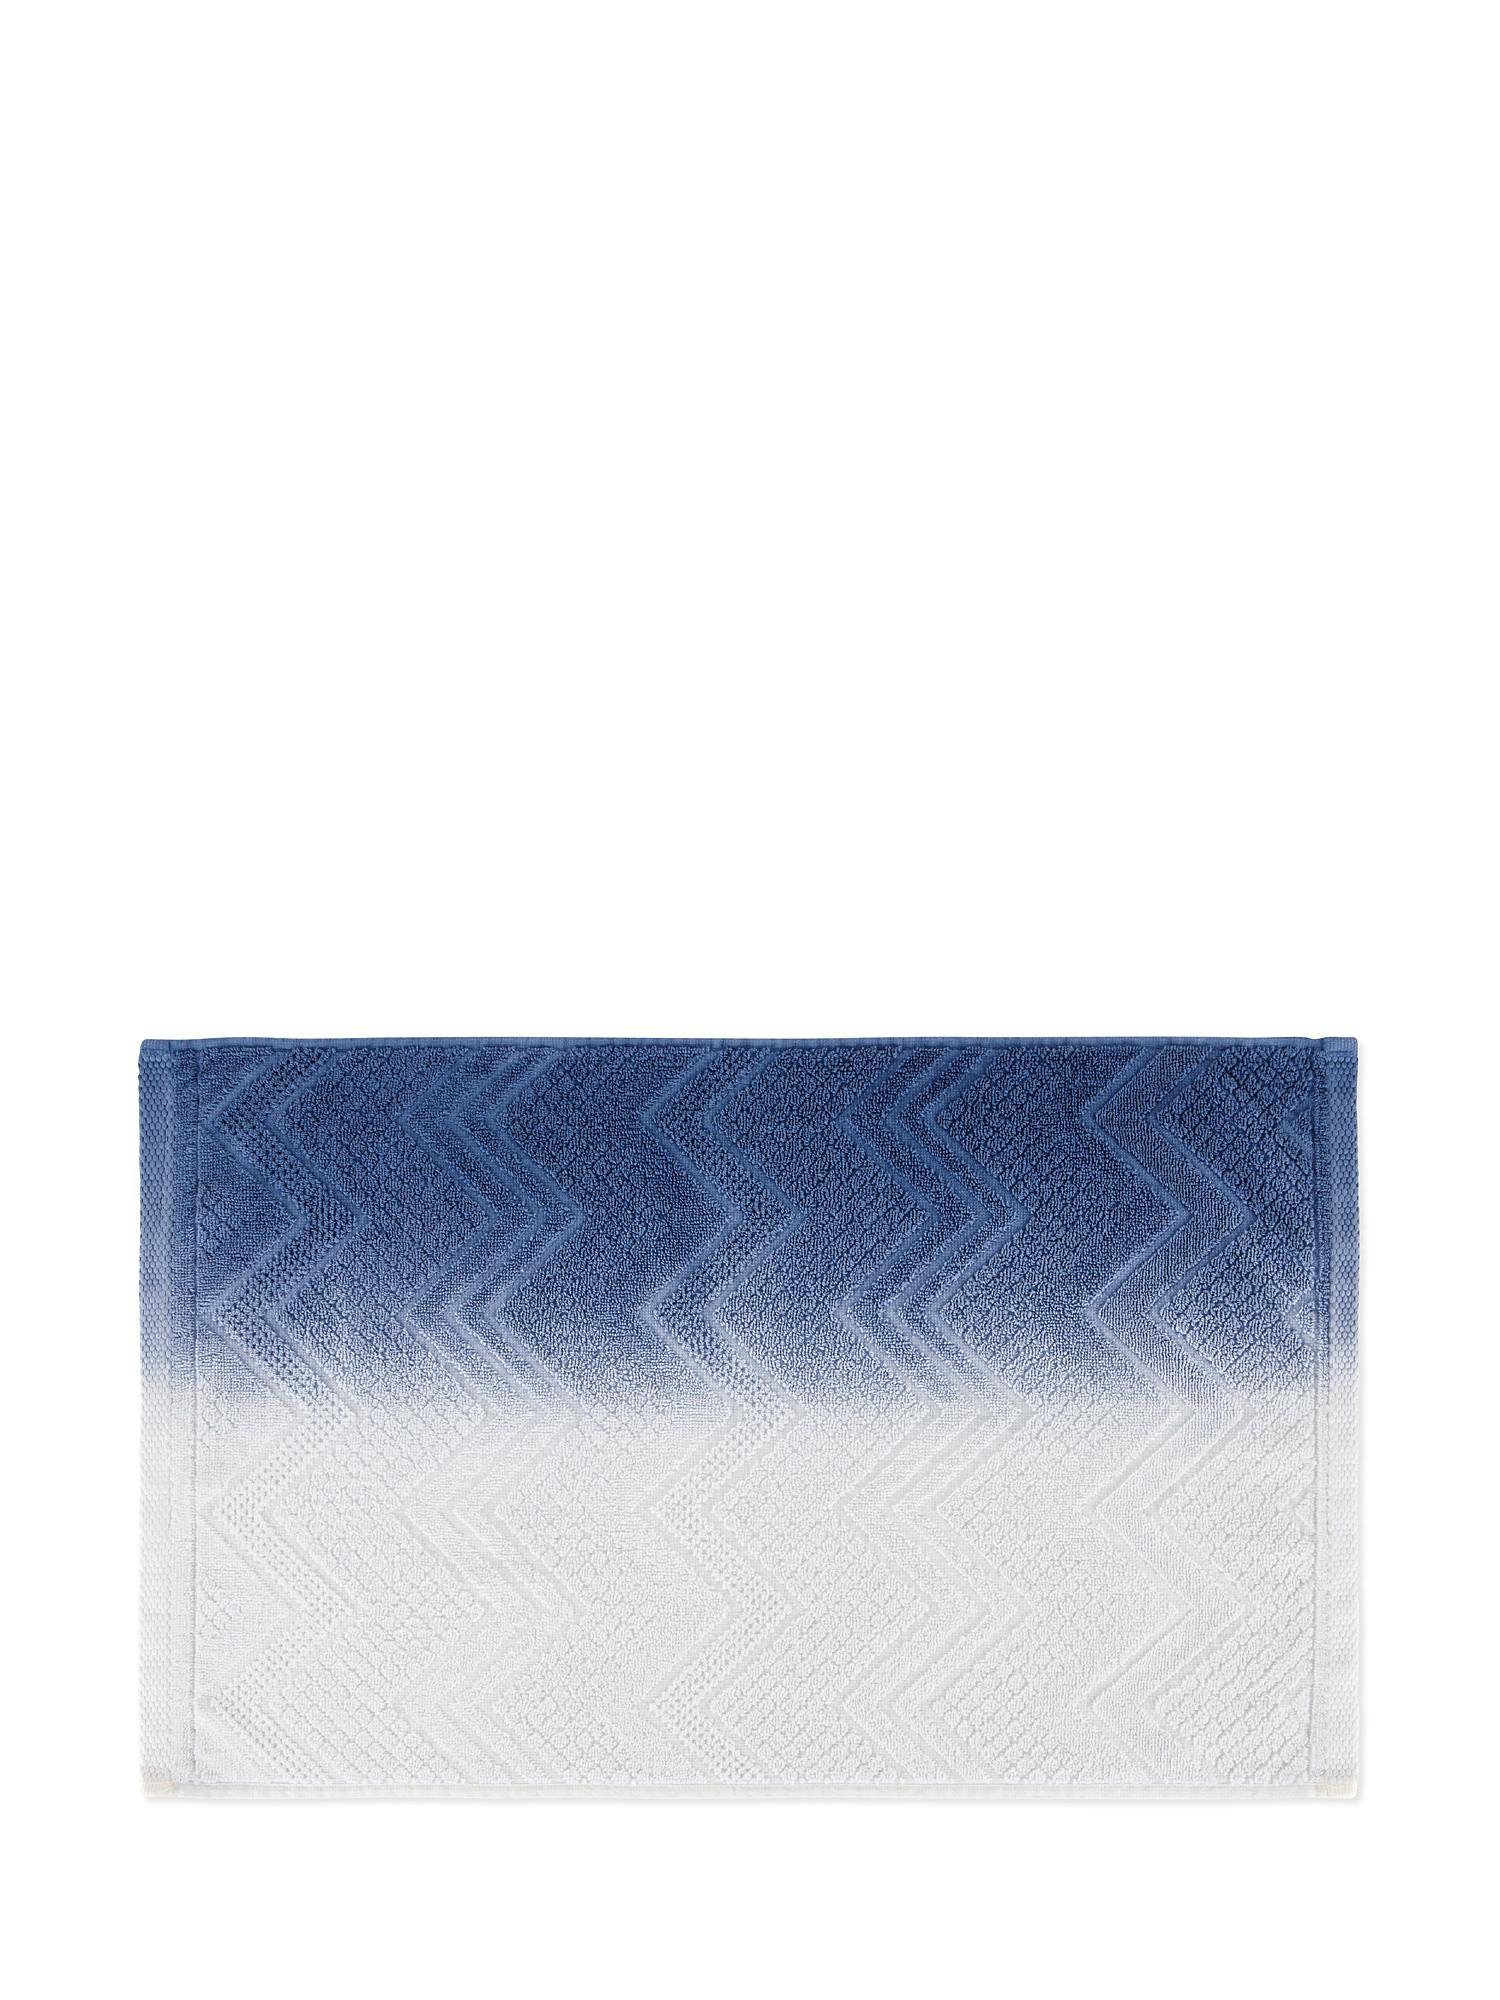 Asciugamano spugna di cotone dip dye, Blu, large image number 2